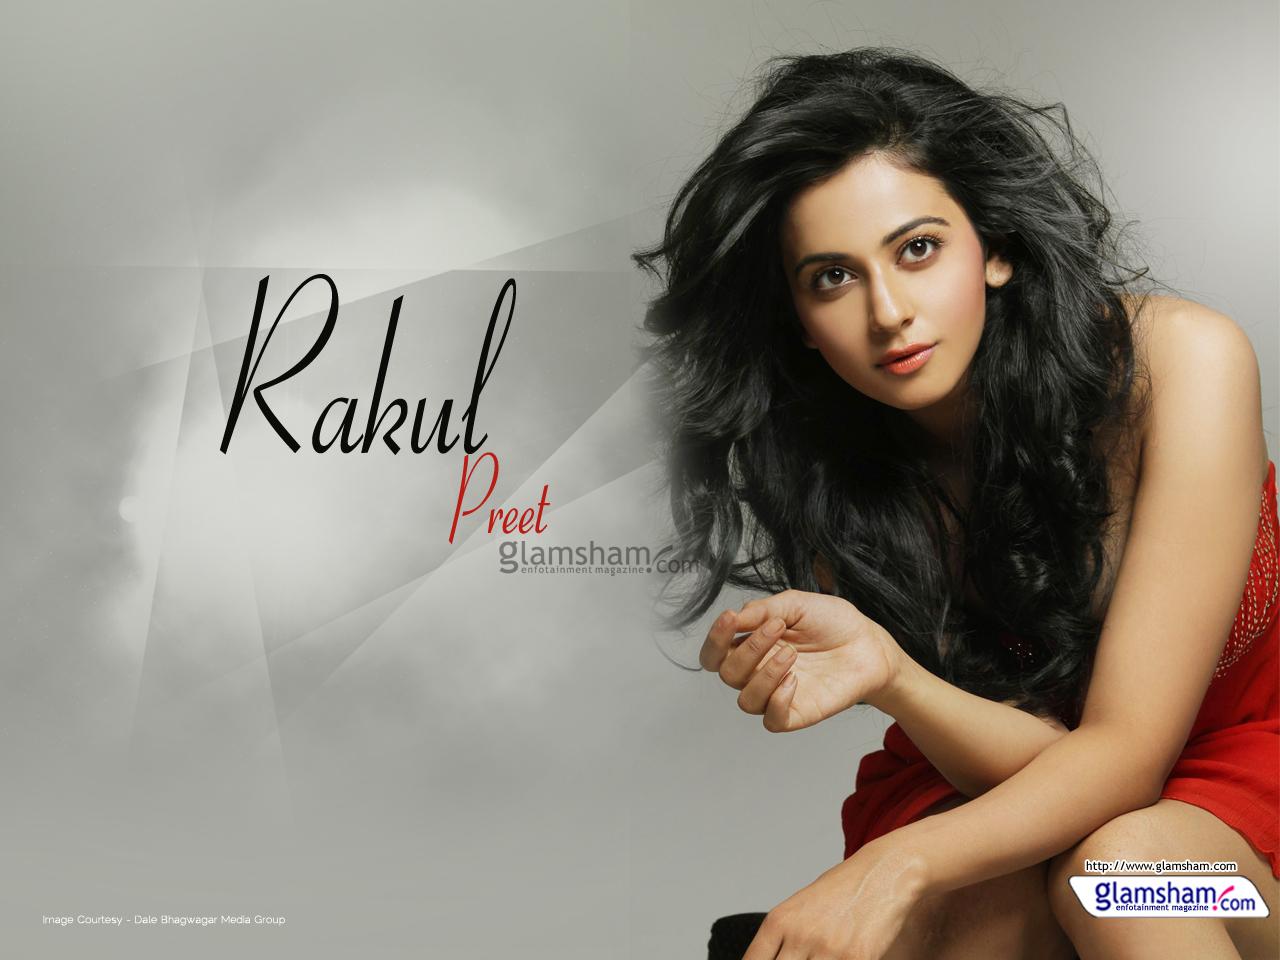 Rakul Preet Singh high resolution image 49766 Glamsham 1280x960